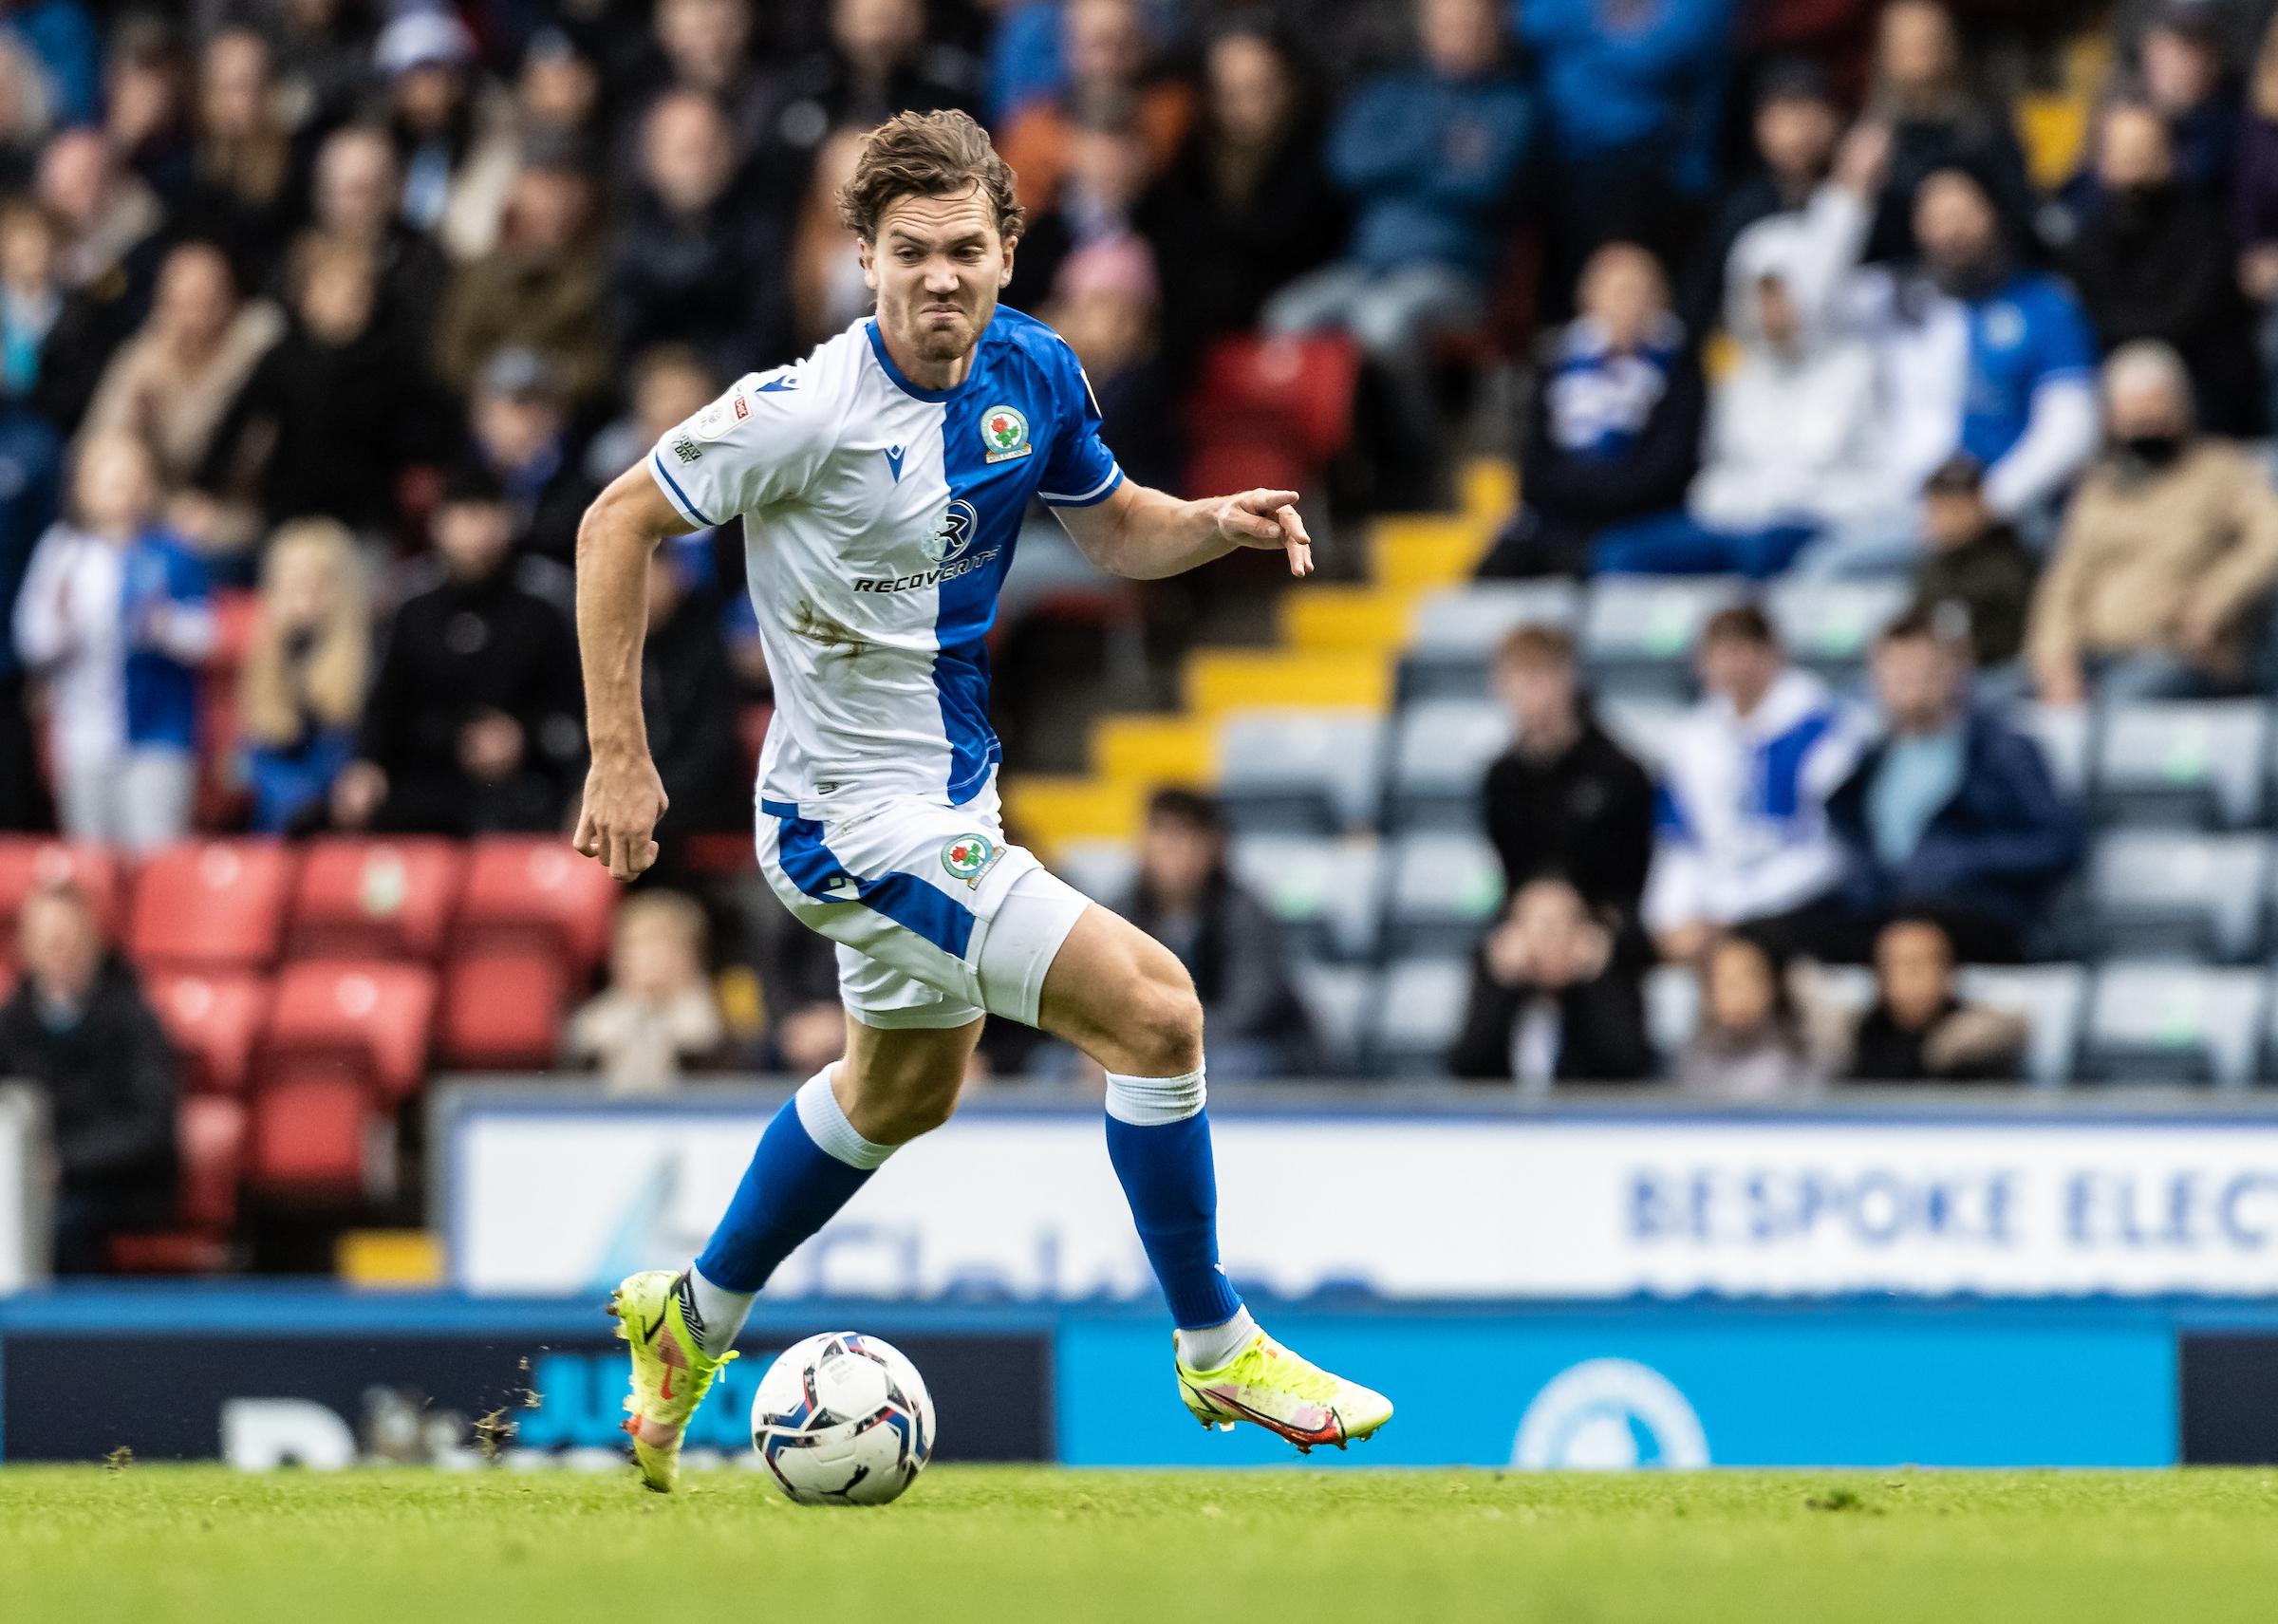 Peringkat: Sam Gallagher menambahkan gol ke workrate dalam kemenangan Blackburn Rovers